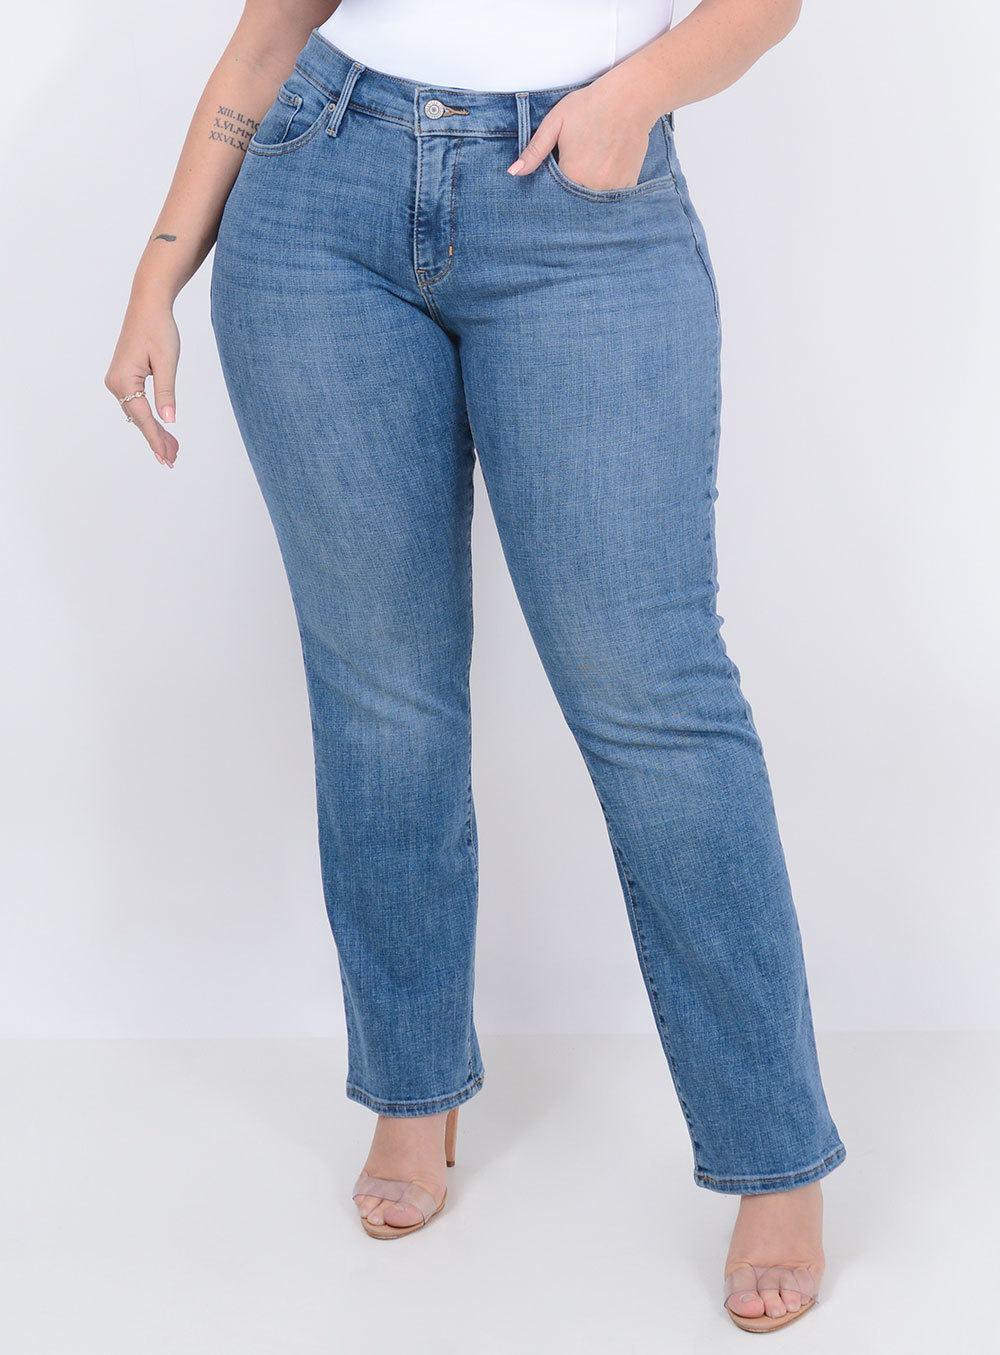 Calça Levi's Jeans Feminina 314 Shaping Straight Índigo ref. LV196410011